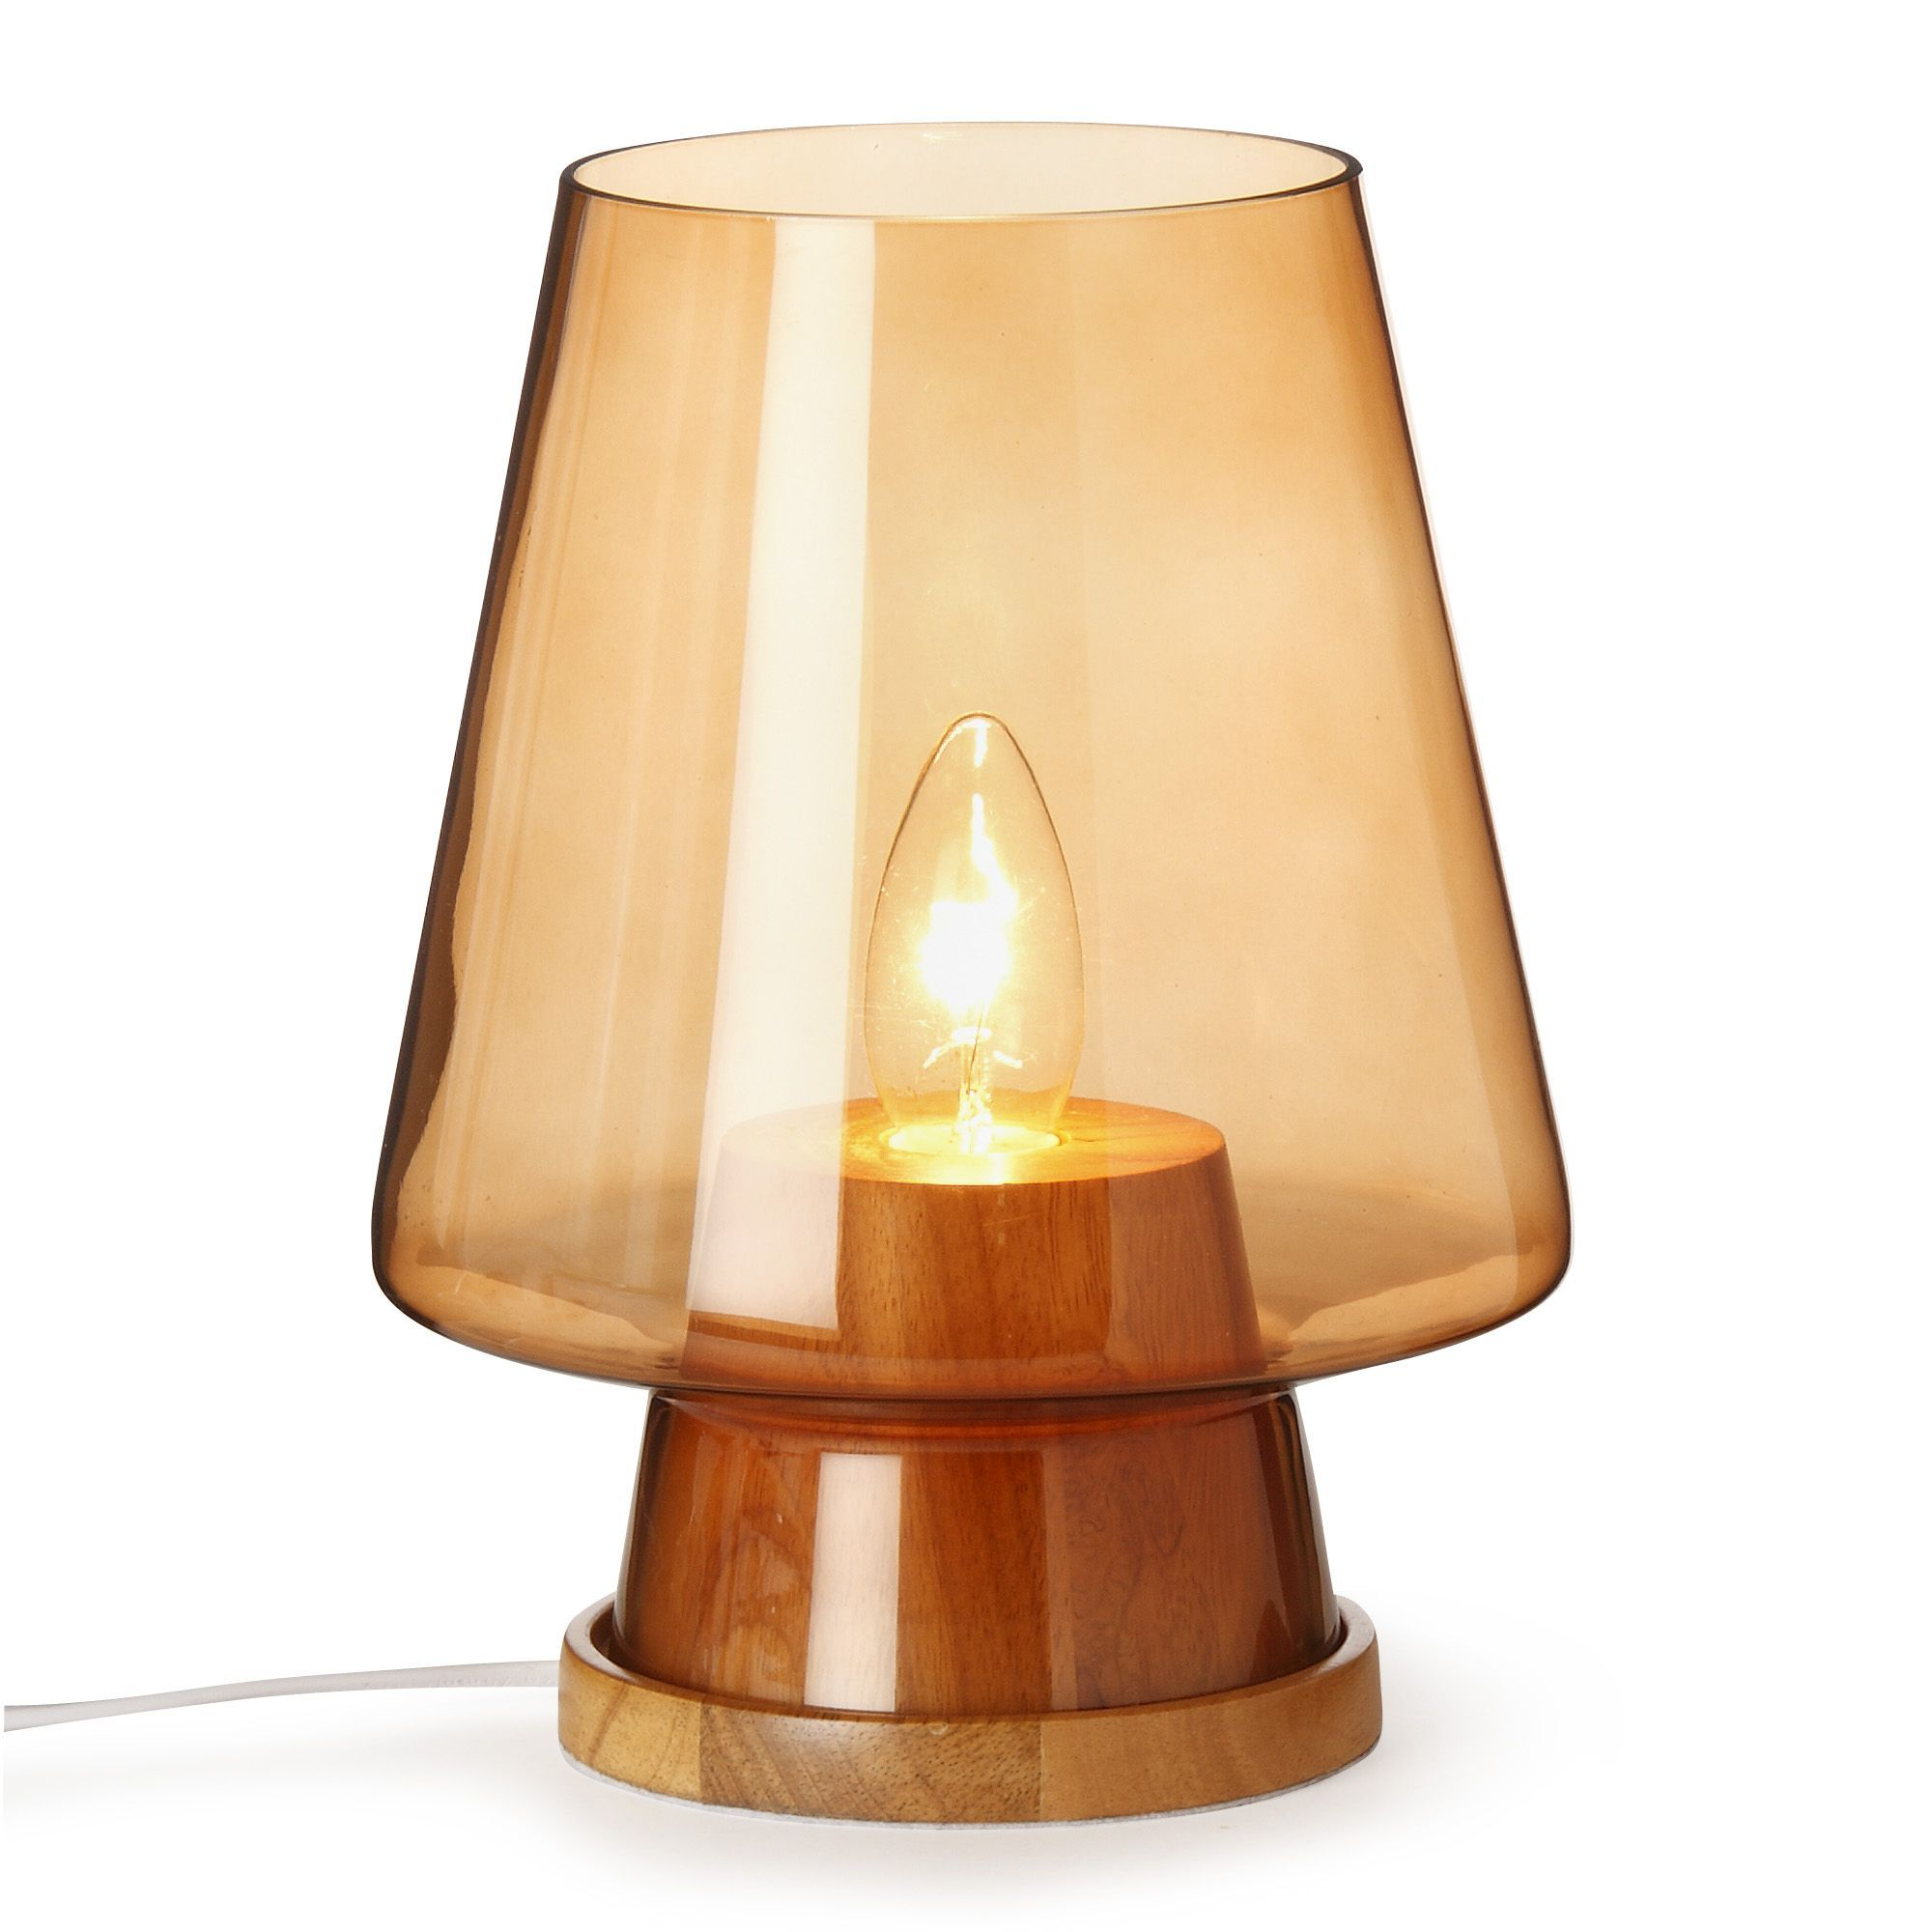 Lampe  poser VERRE FUMé H25cm Swan Lampes  poser Luminaires